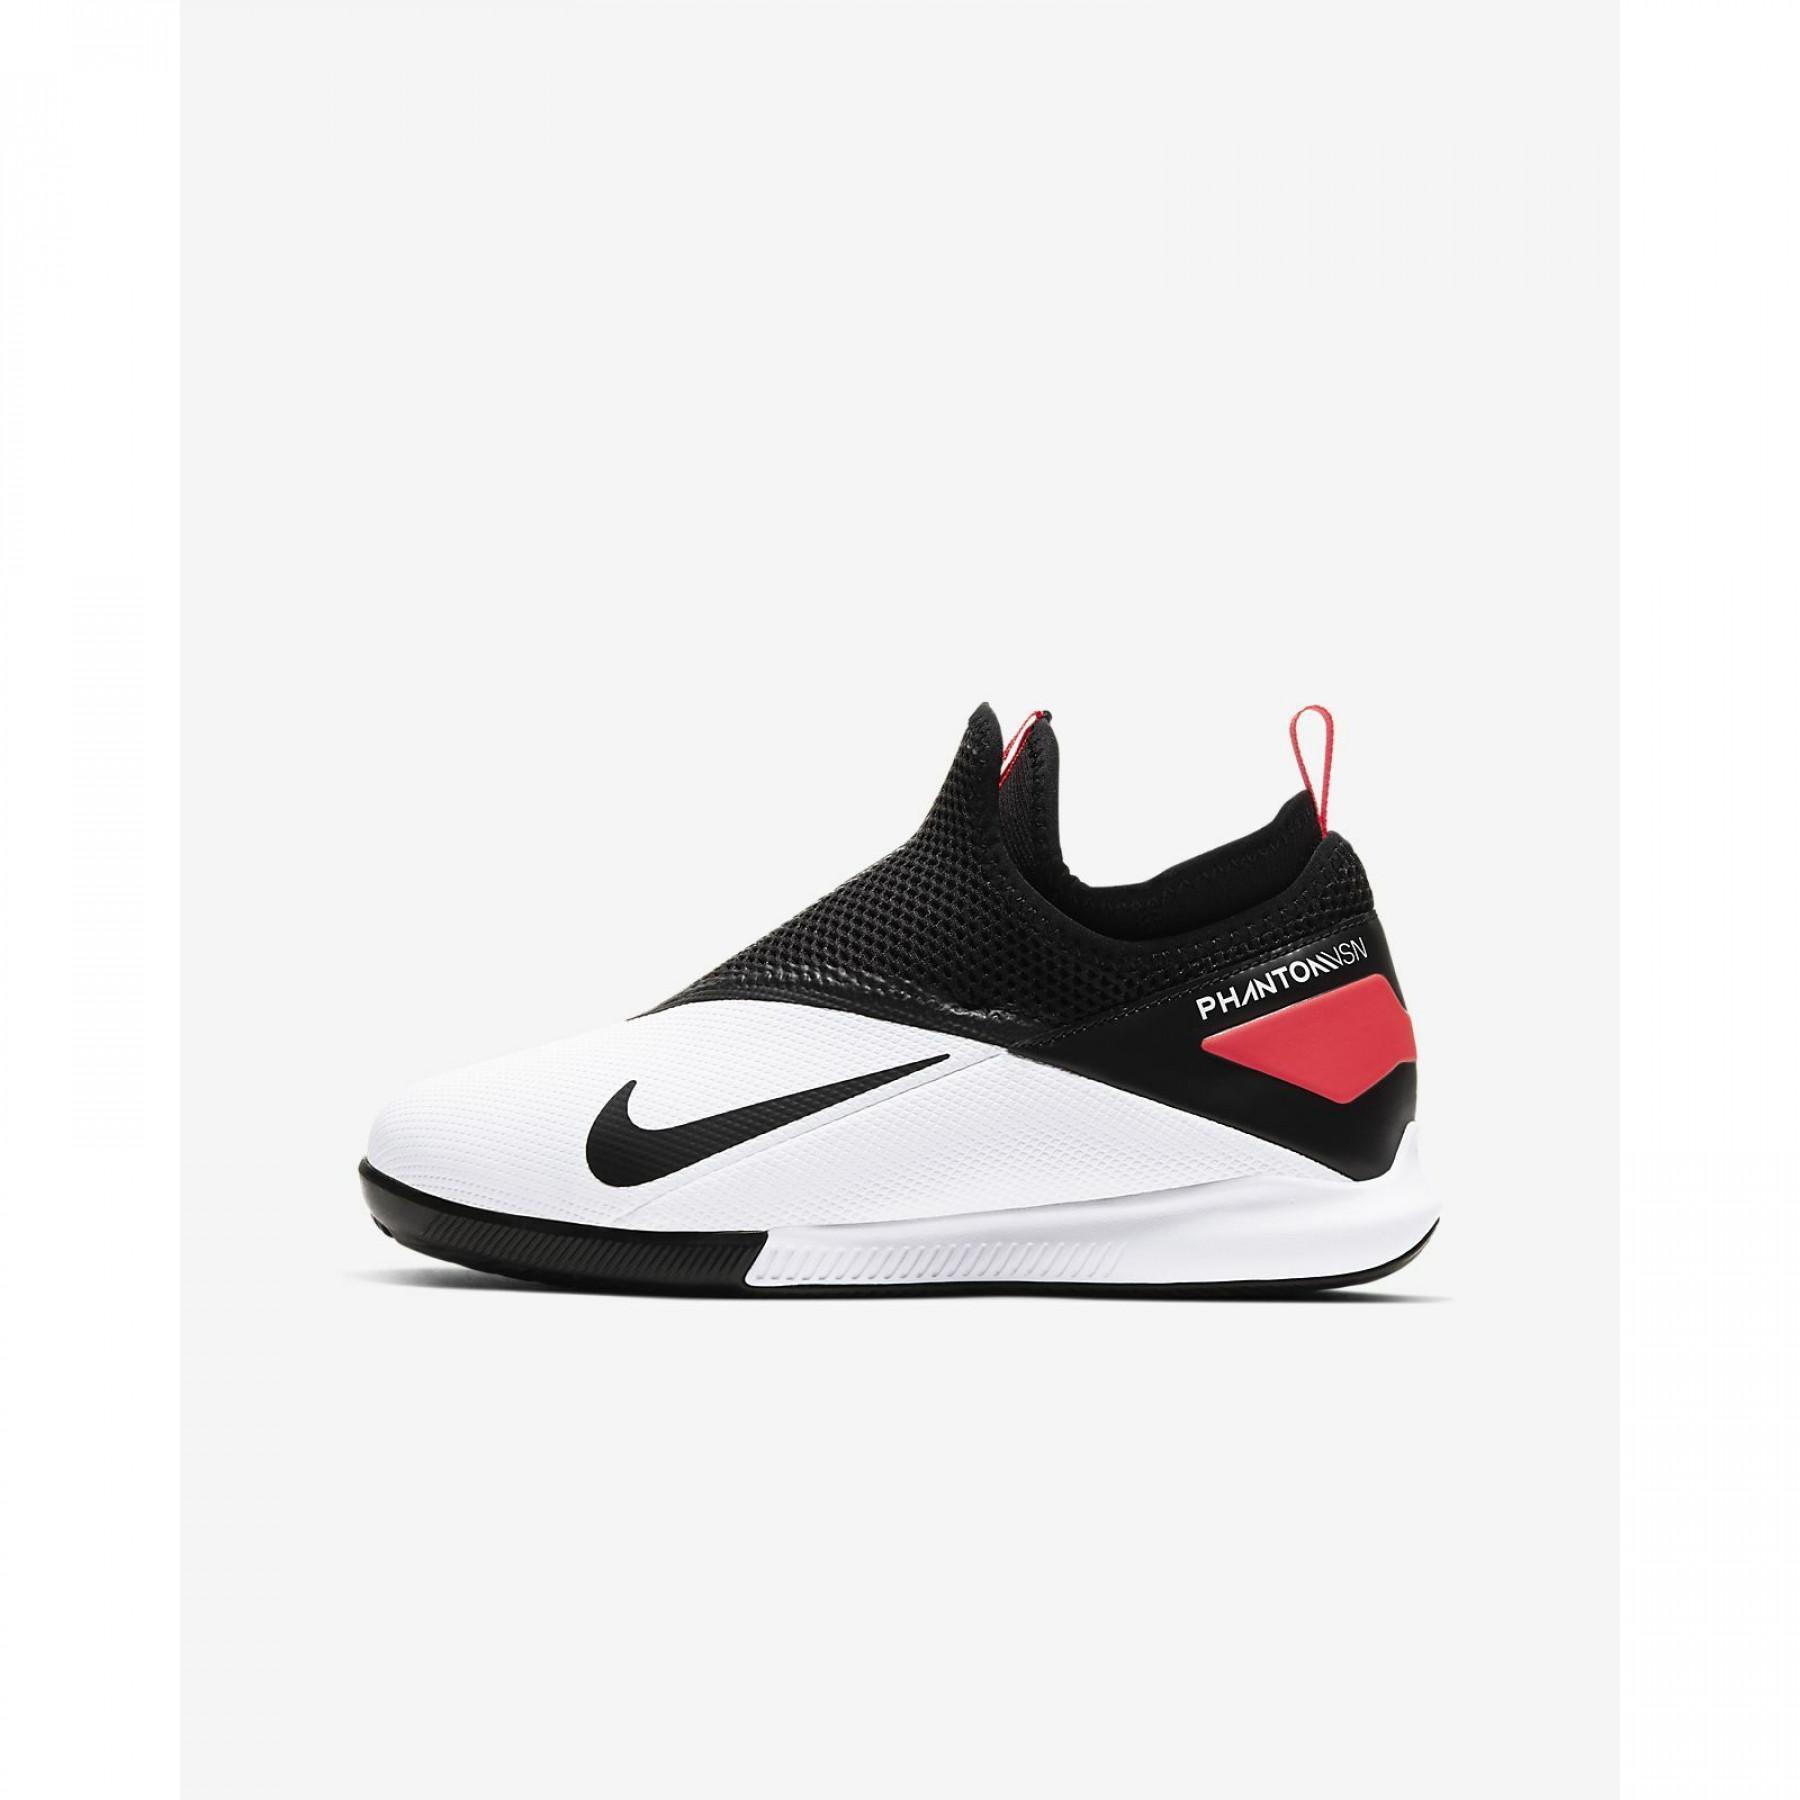 Chaussures kid Nike Phantom Vision 2 Academy DFit Indoor